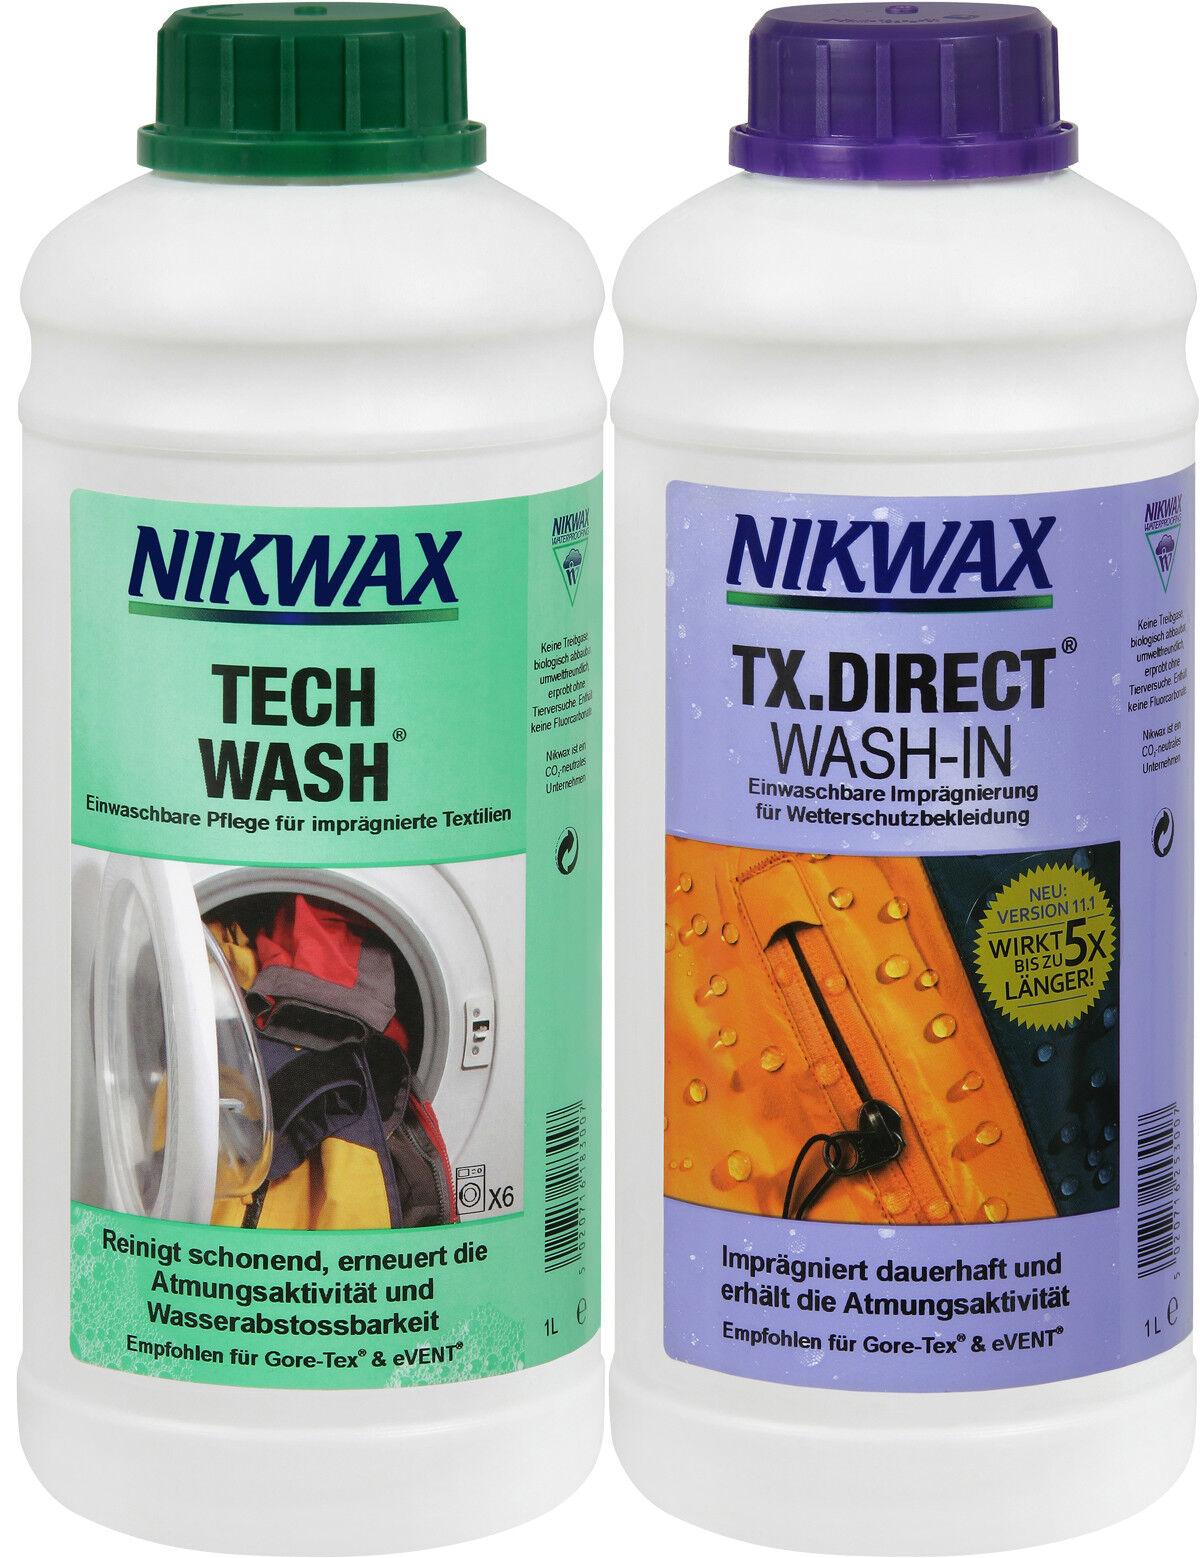 (Euro 22,50   1 Liter) 2 x 1 L Nikwax Tech Wash + TX Direkt Waschmittel Membran